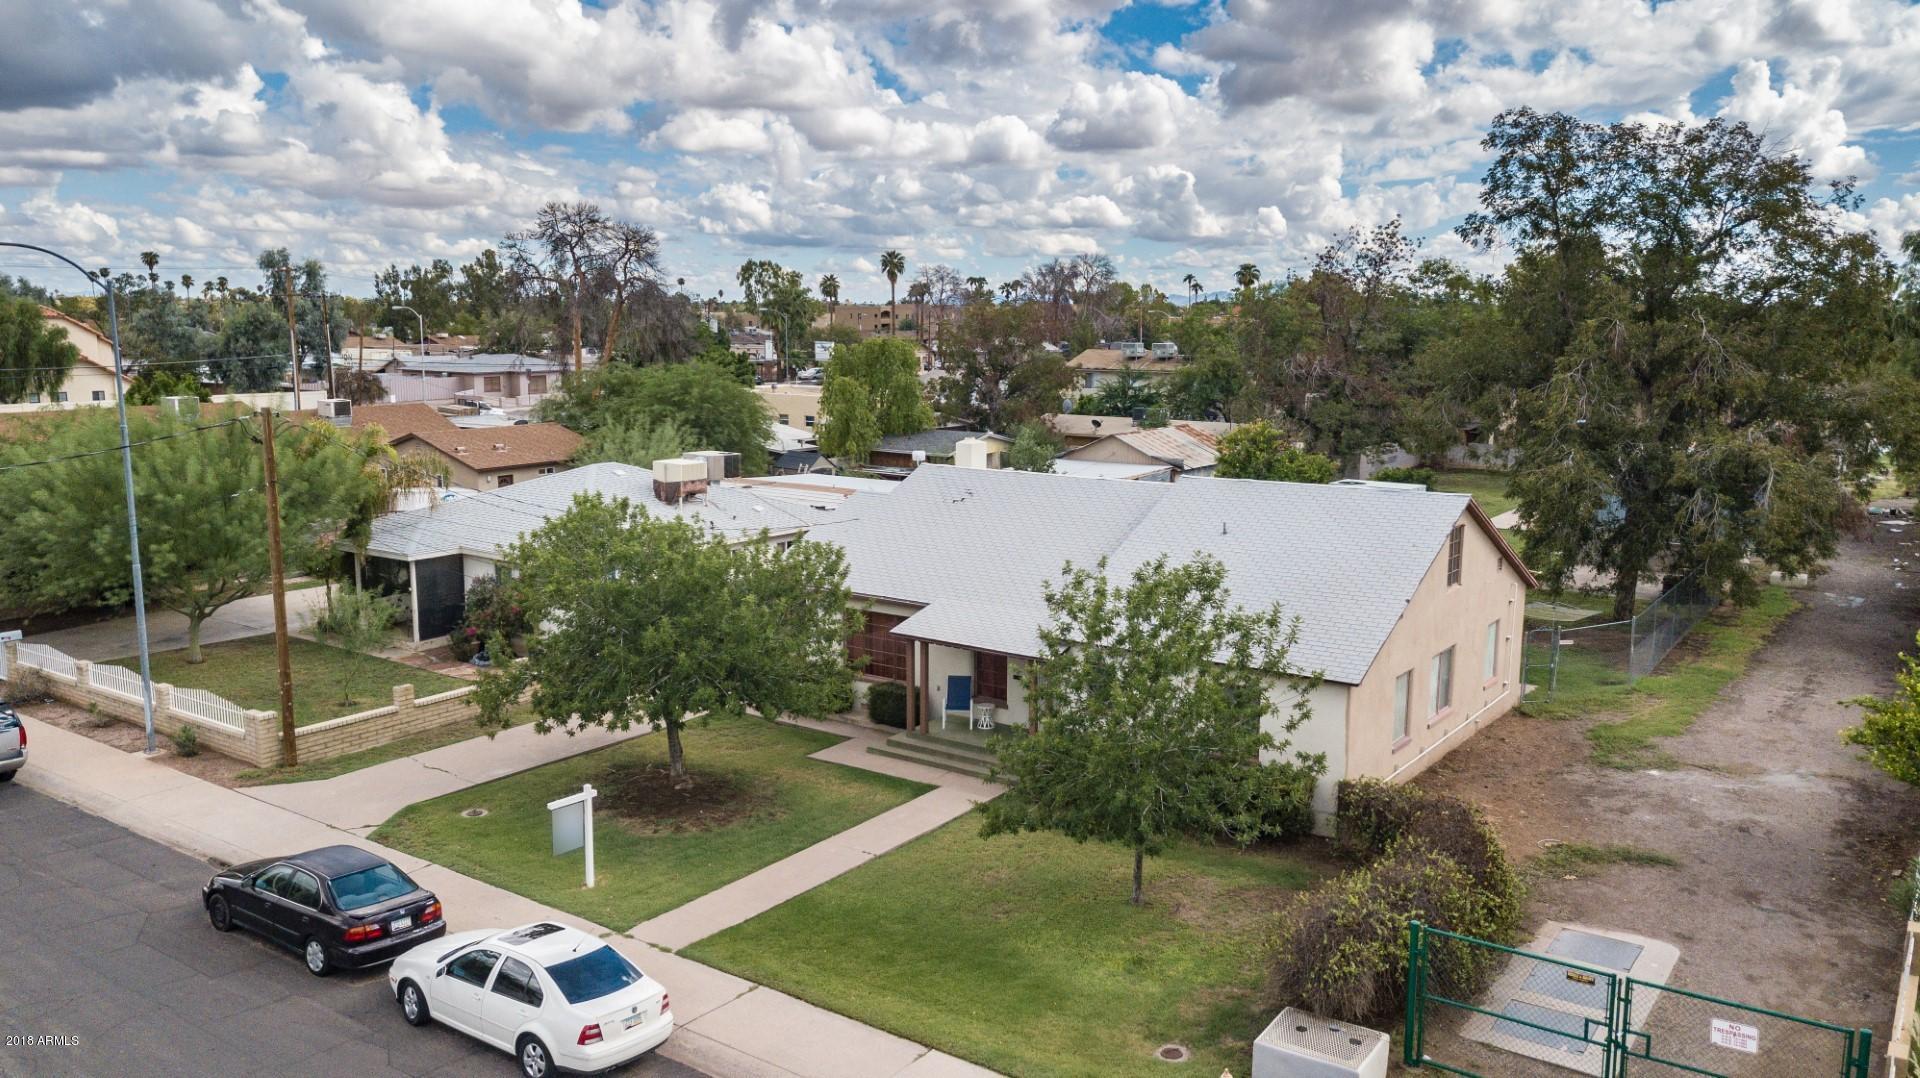 MLS 5829382 331 E 5TH Avenue, Mesa, AZ 85210 Mesa AZ West Mesa